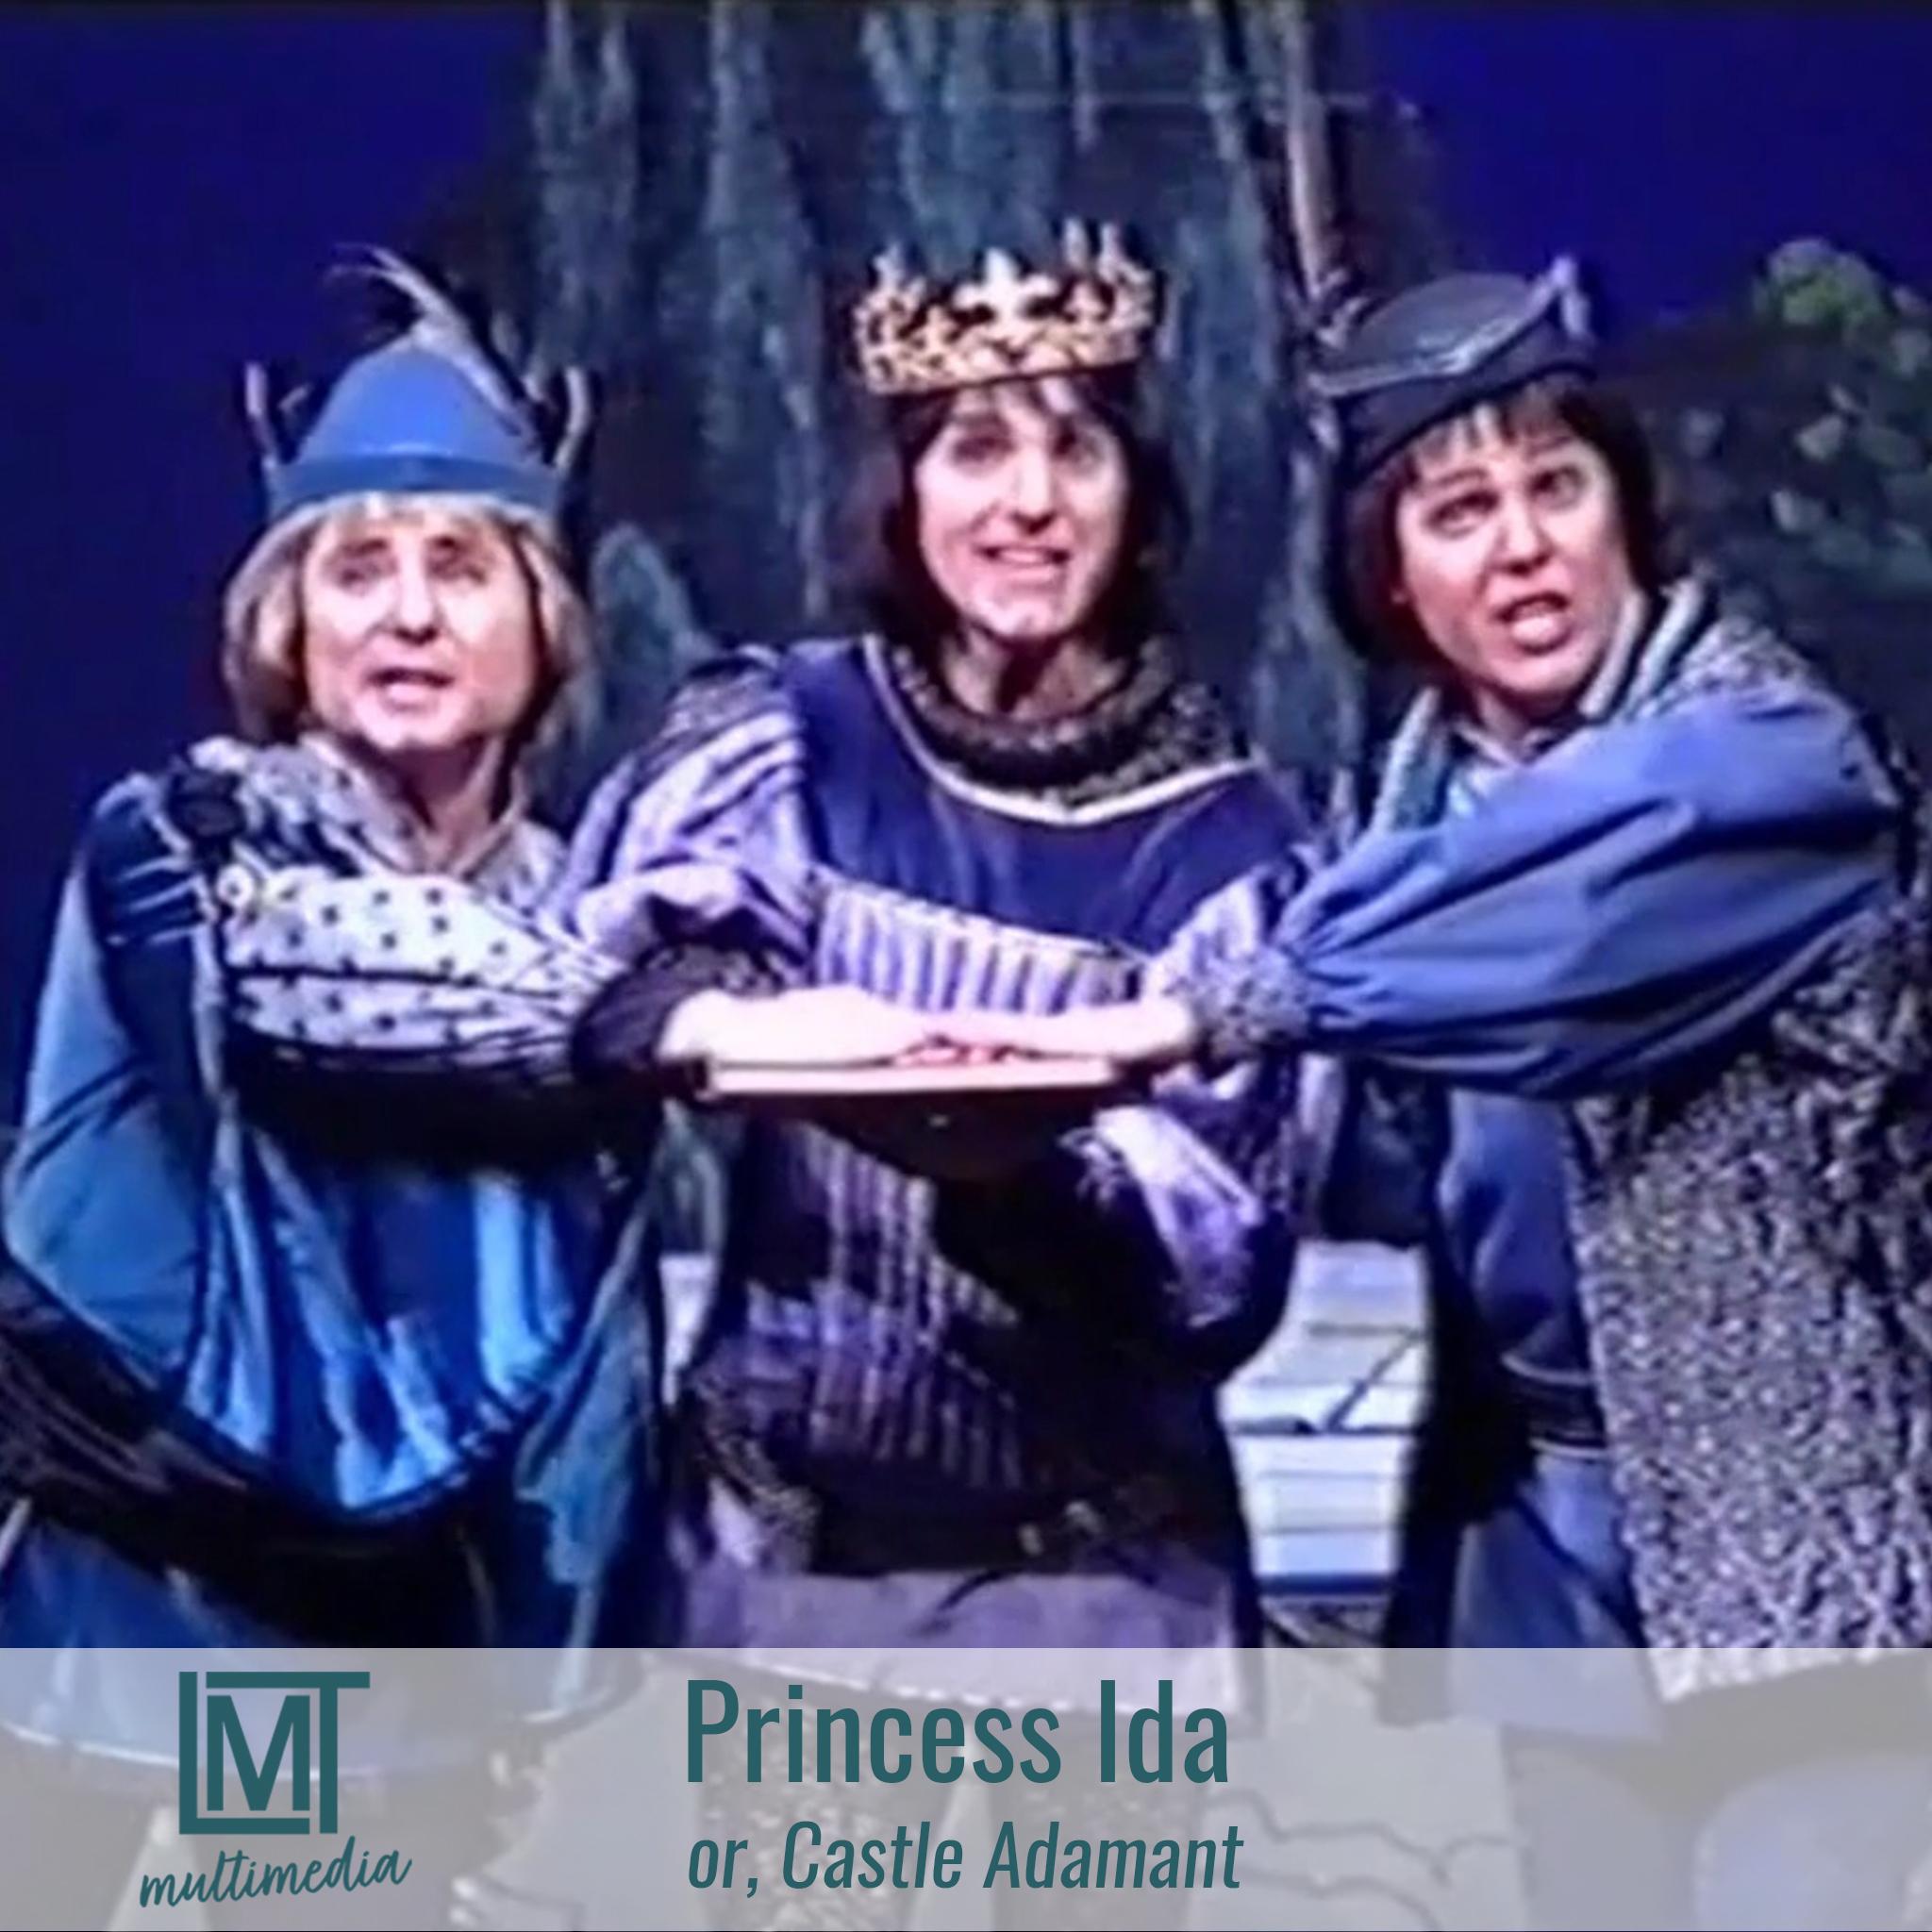 Princess Ida: Or, Castle Adamant